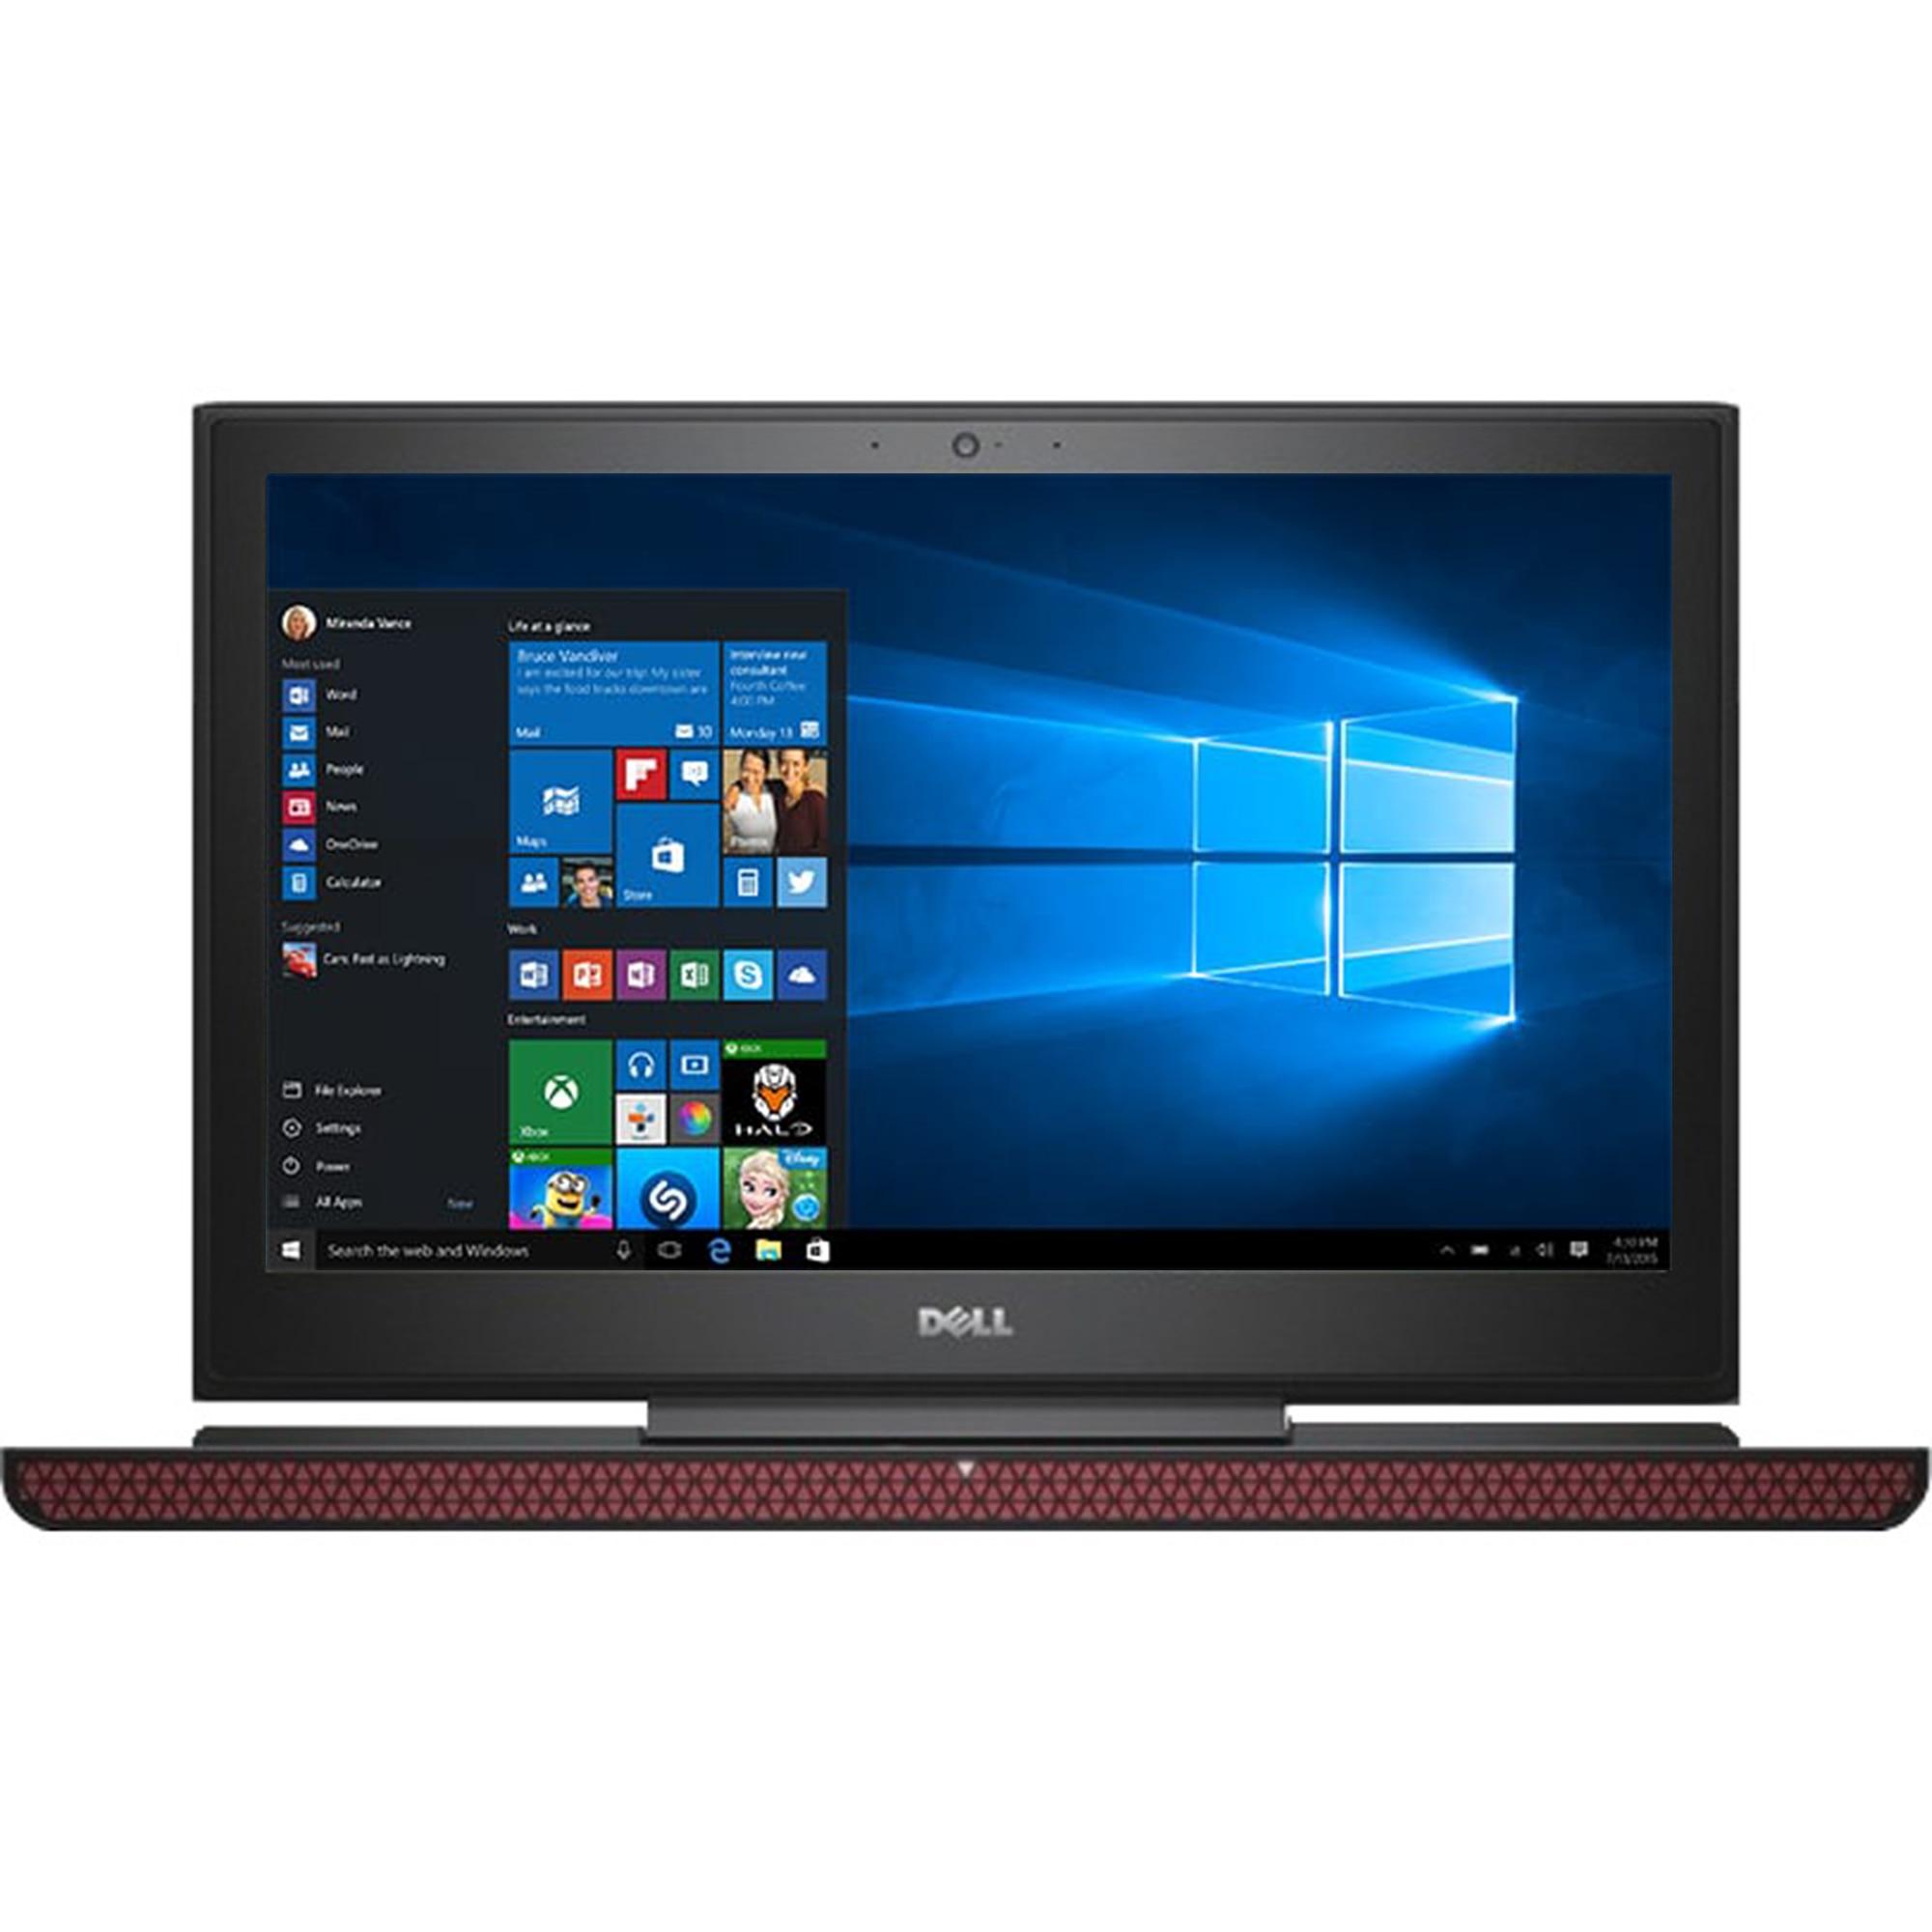 "Fotografie Laptop Gaming Dell Inspiron 7567 cu procesor Intel® Core™ i7-7700HQ 2.80 GHz, Kaby Lake™, 15.6"", UHD, 8GB, 1TB + 128GB SSD, nVIDIA GeForce GTX 1050 Ti 4GB, Microsoft Windows 10 Home, Black"